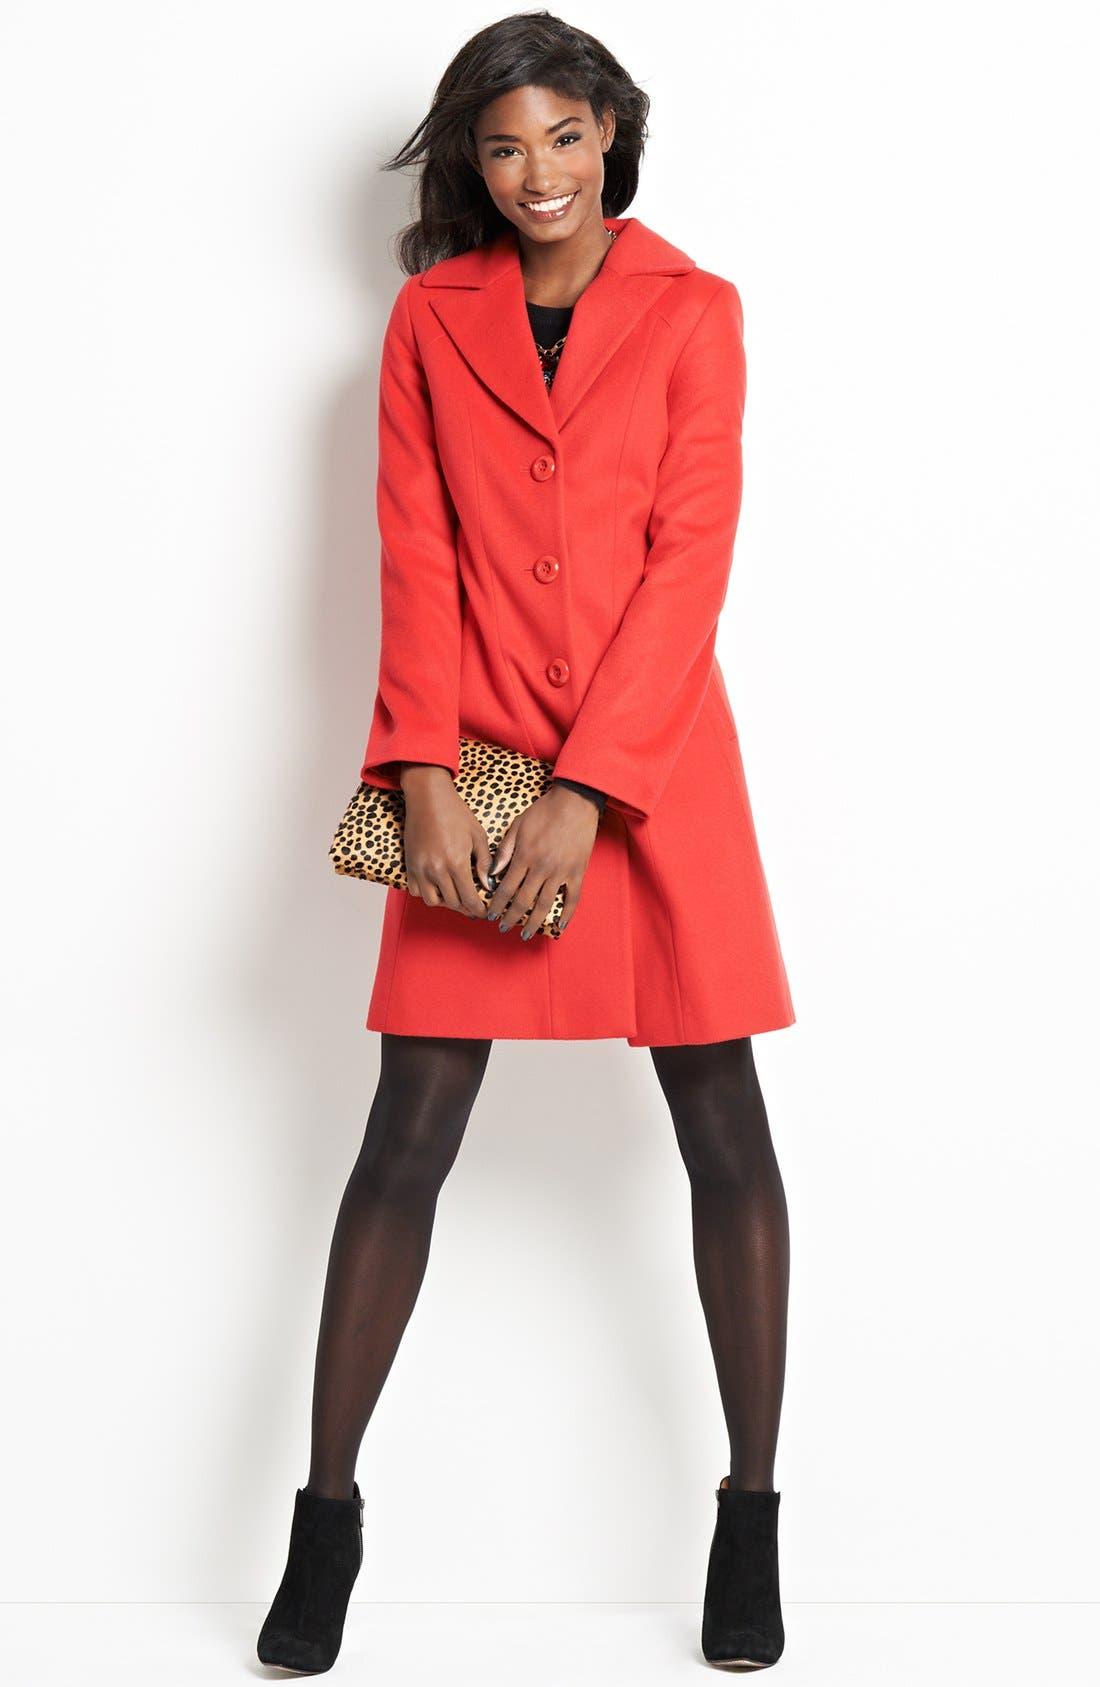 Main Image - Kristen Blake Single Breasted Lambswool Blend Coat (Regular & Petite) (Nordstrom Exclusive)